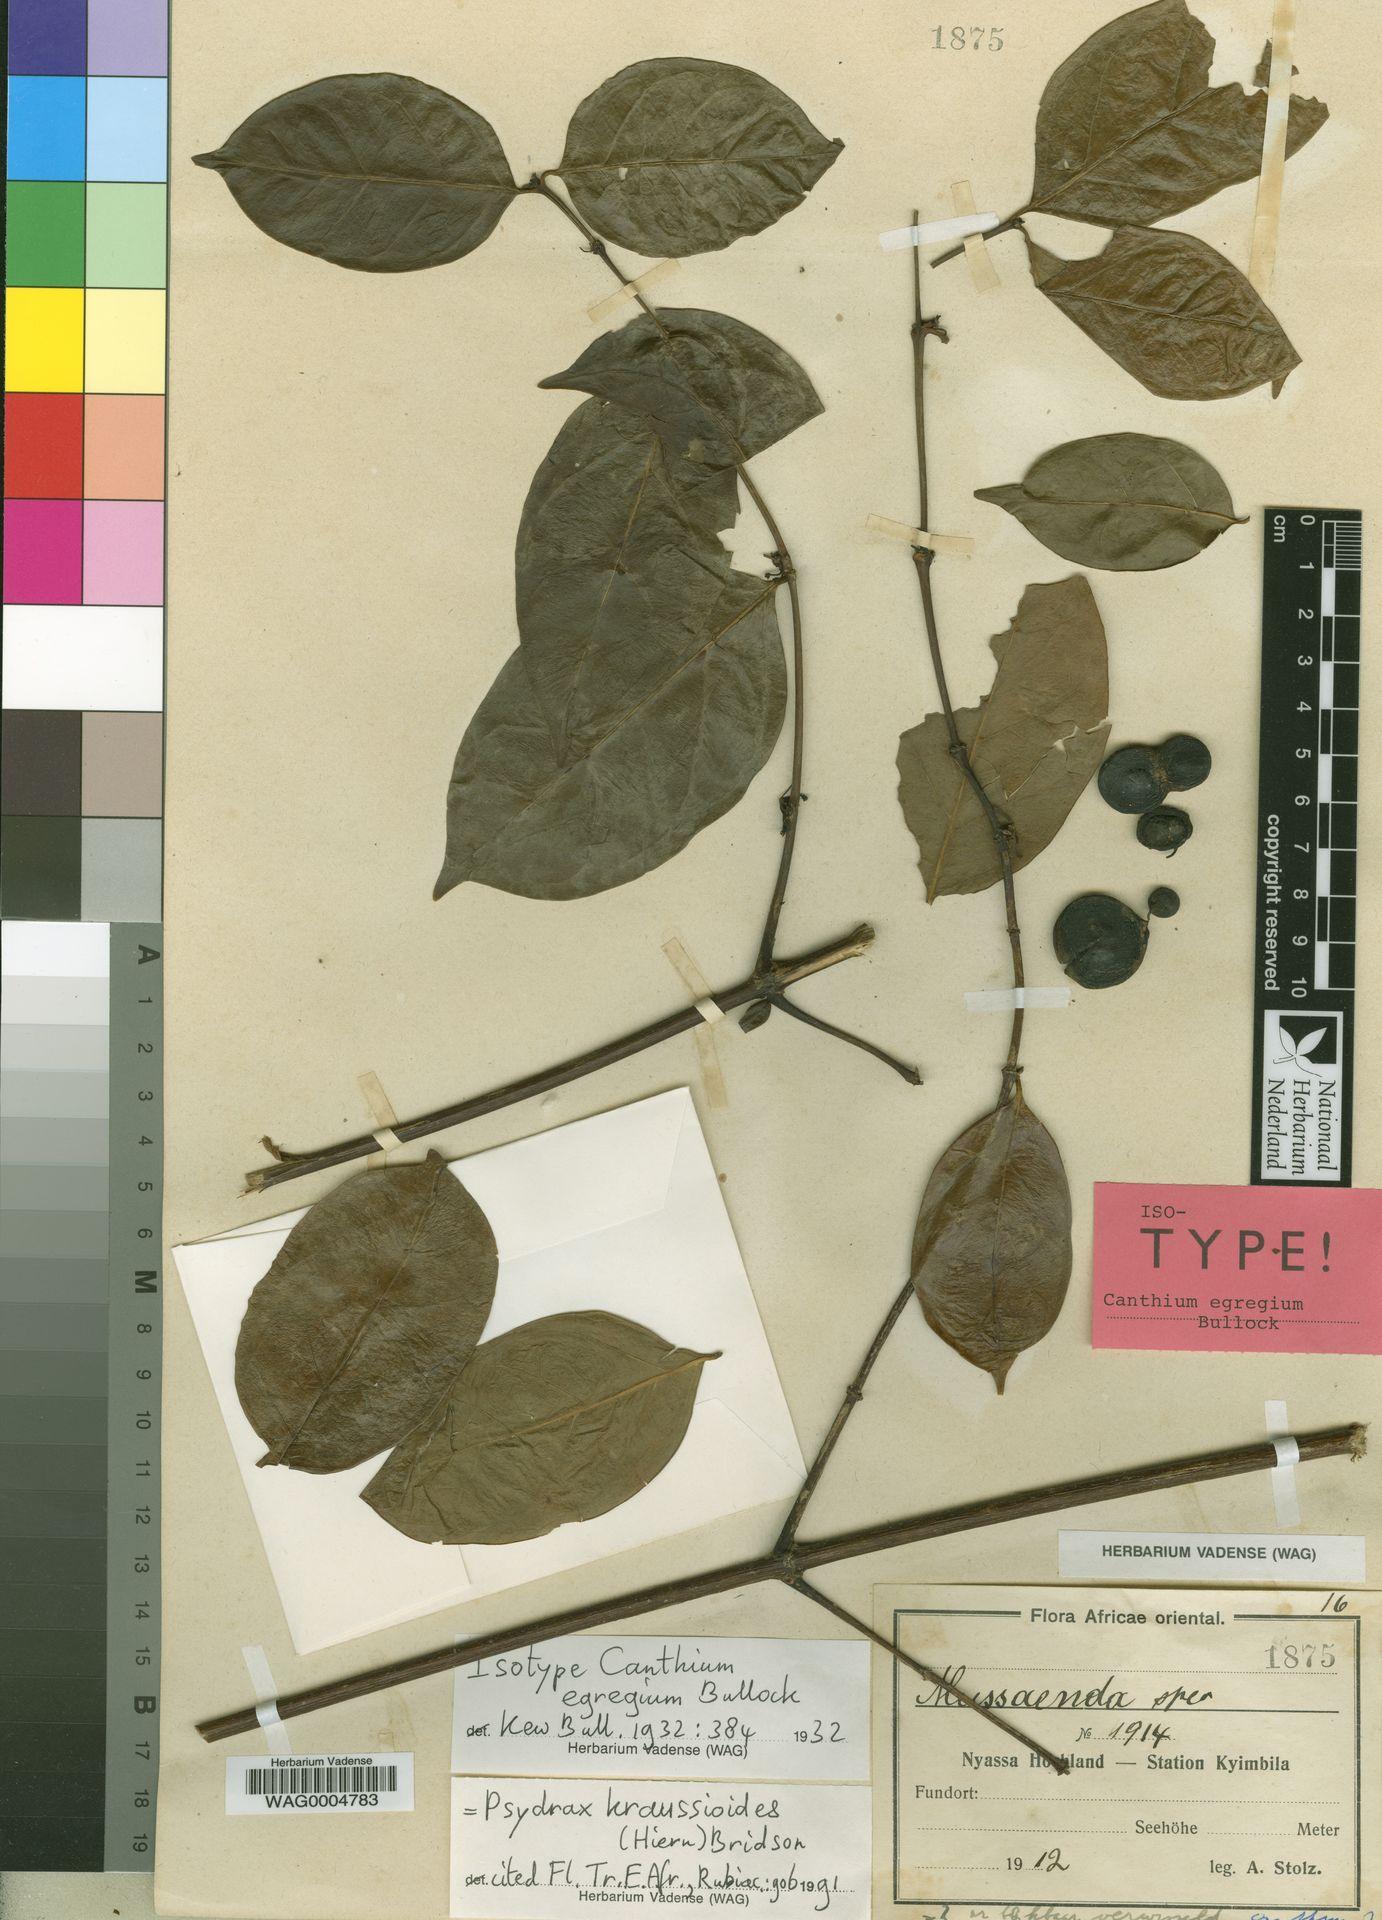 WAG0004783 | Psydrax kraussioides (Hiern) Bridson